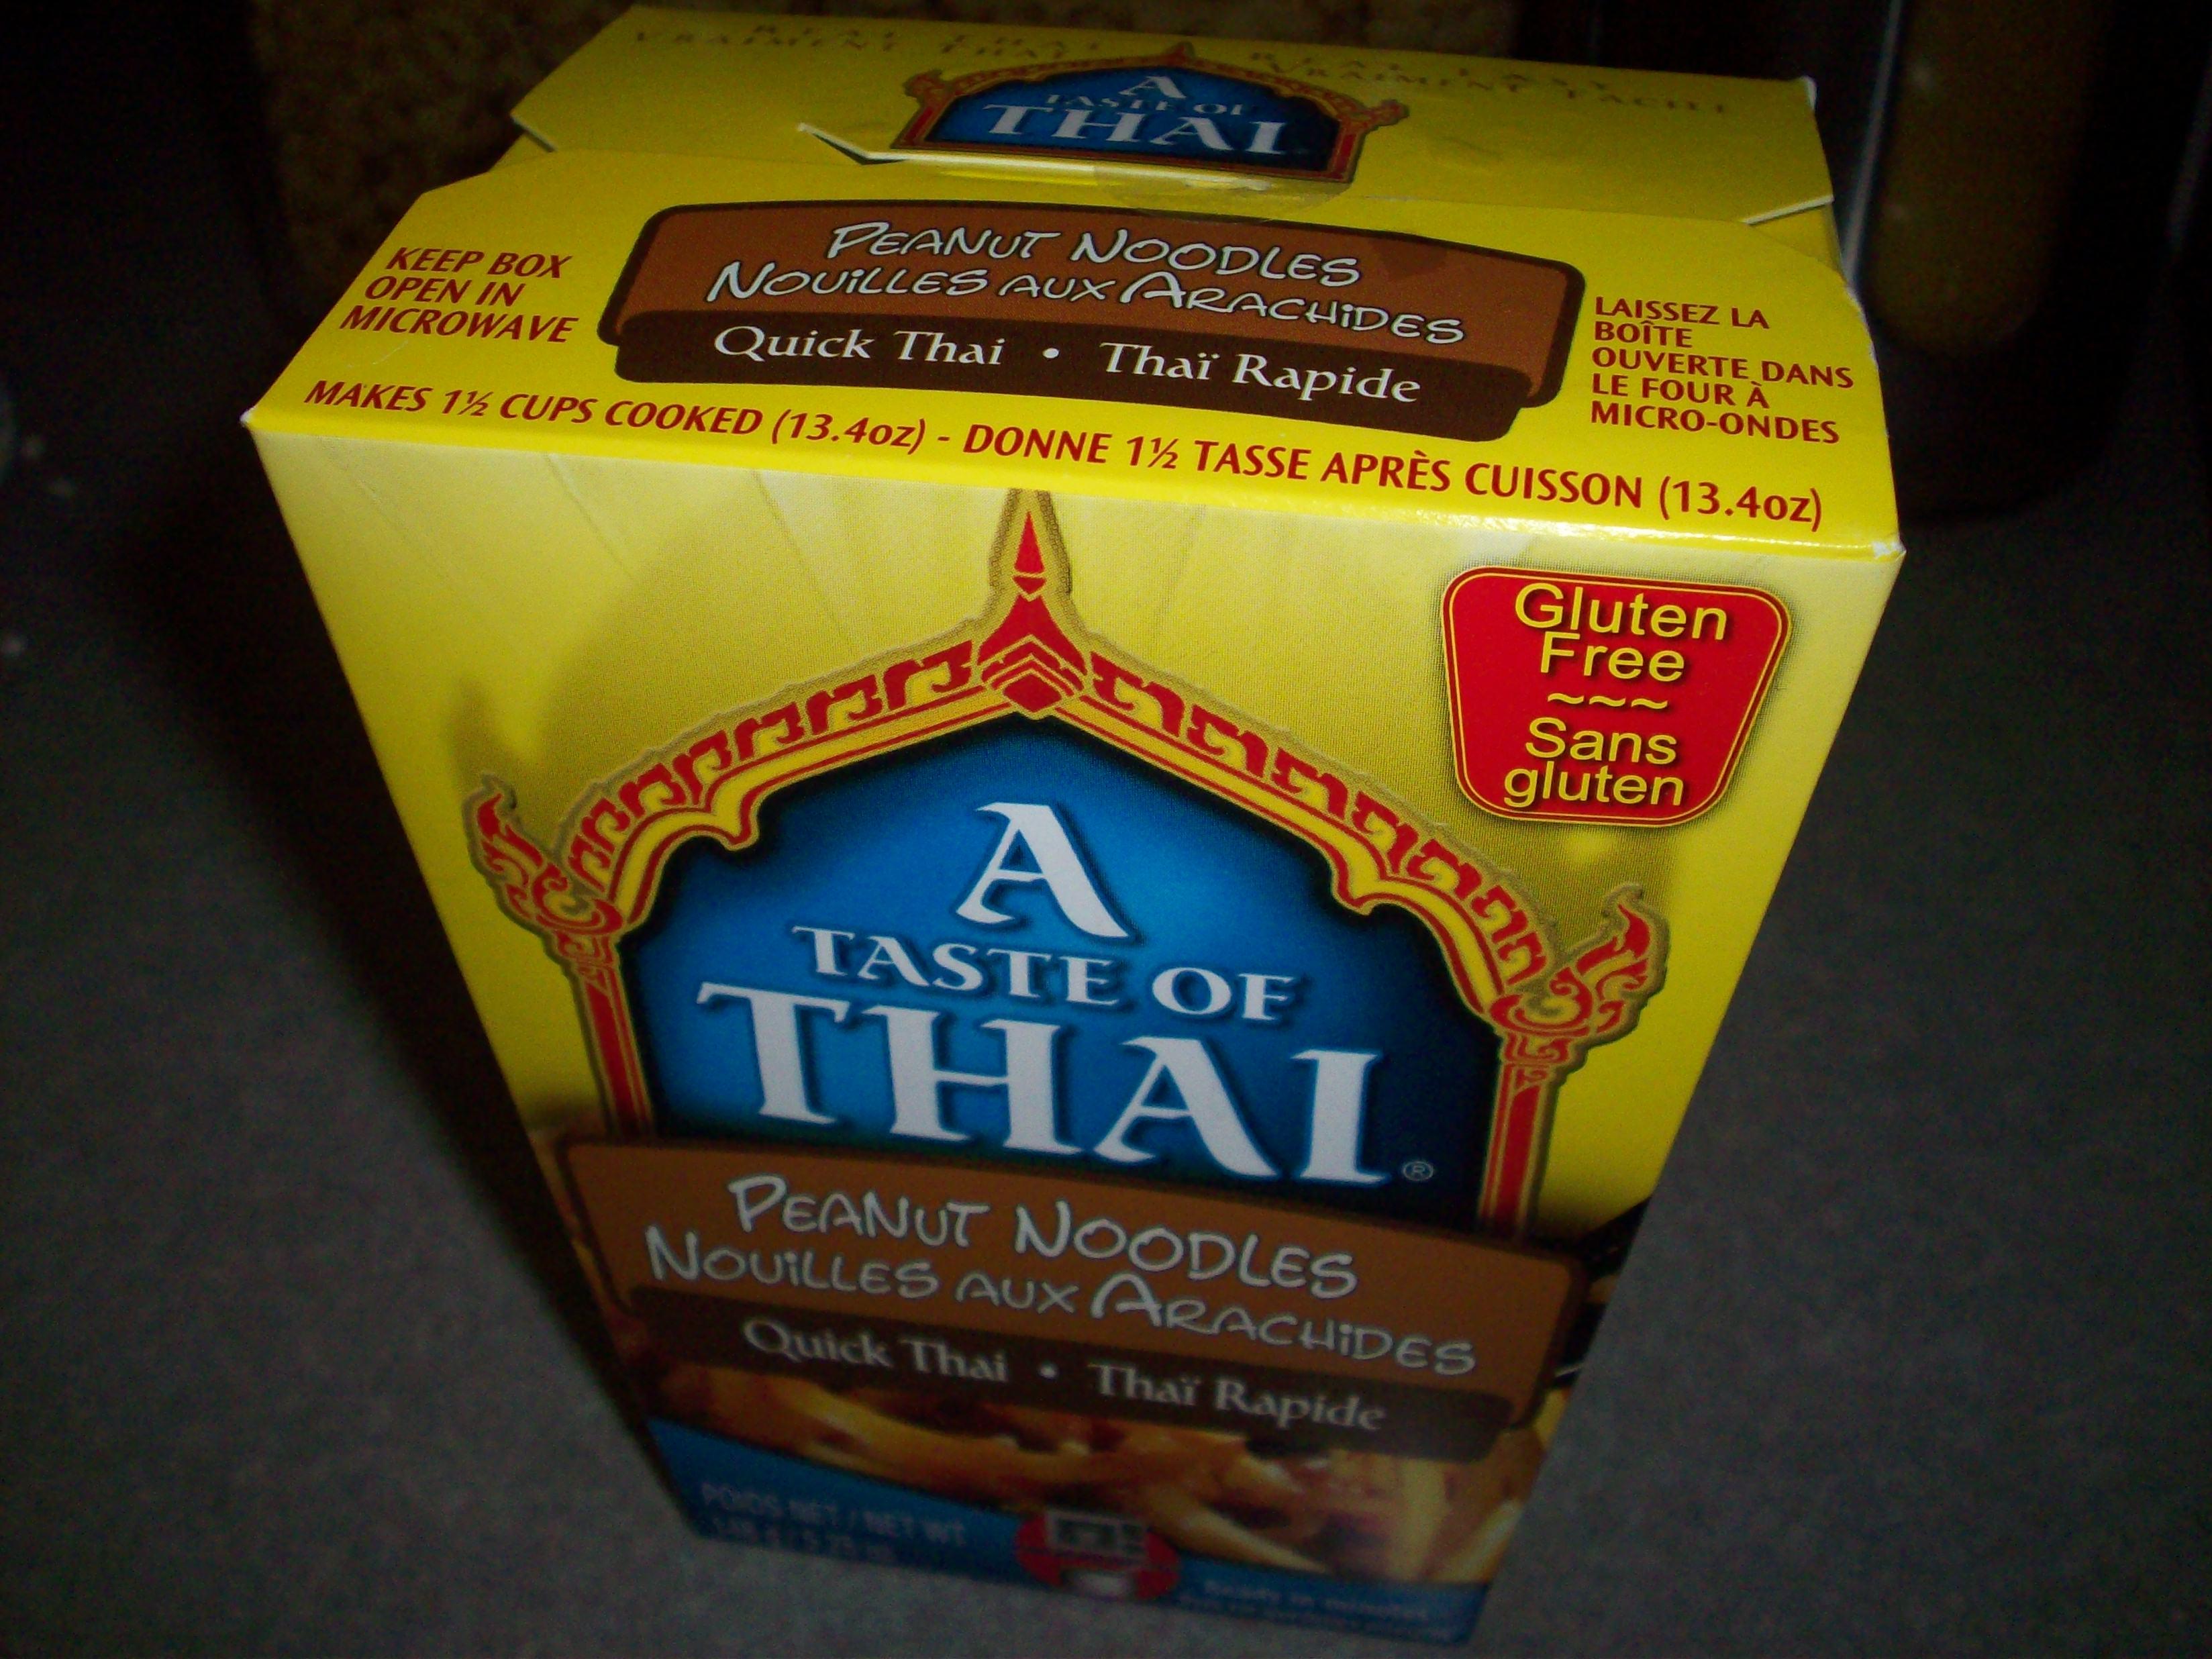 http://foodloader.net/cutie_2010-06-01_Peanut_Noodles1.jpg